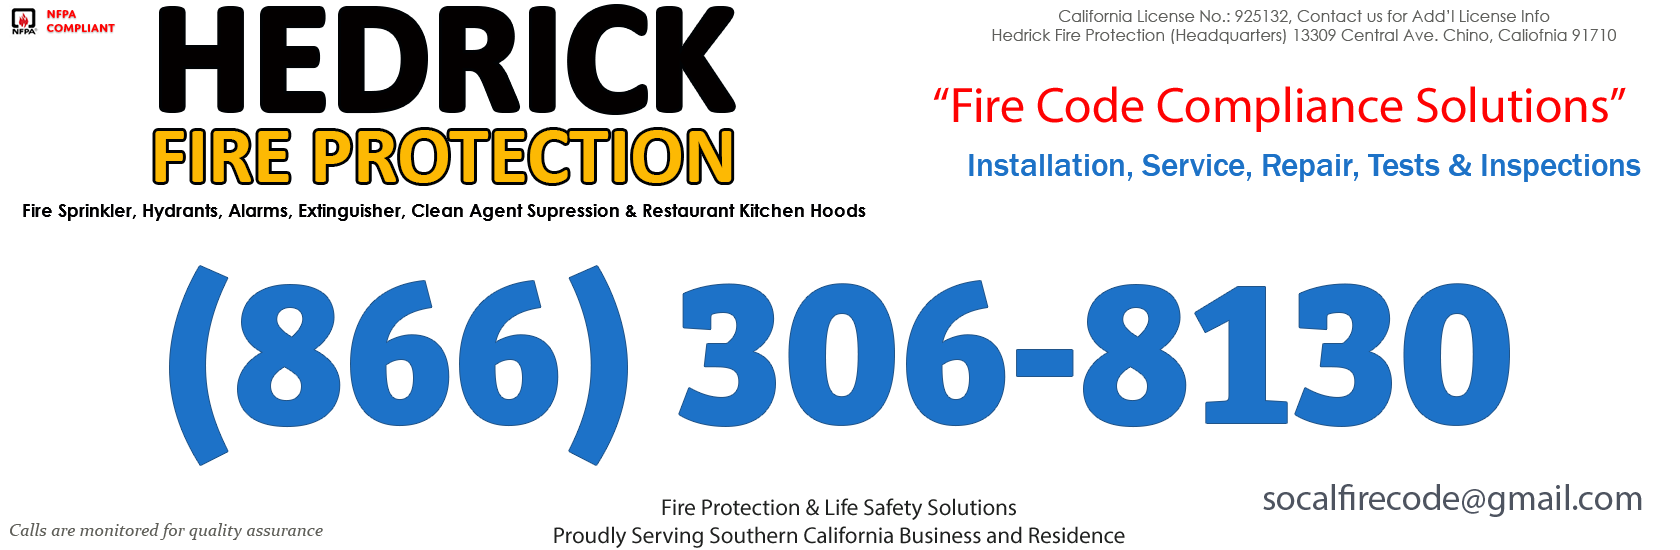 Chino Hills, California Fire Sprinkler Service Company